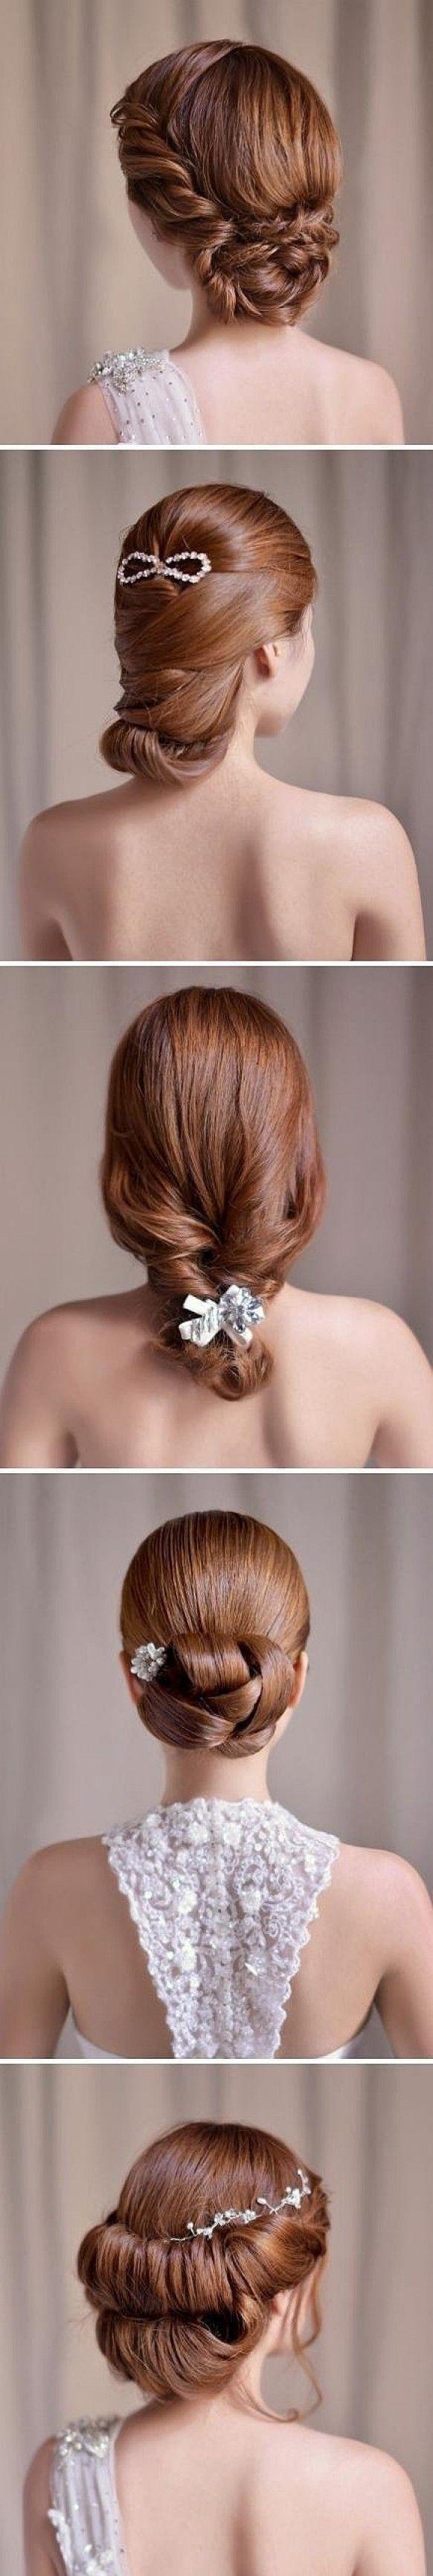 Peinado de novia / boda